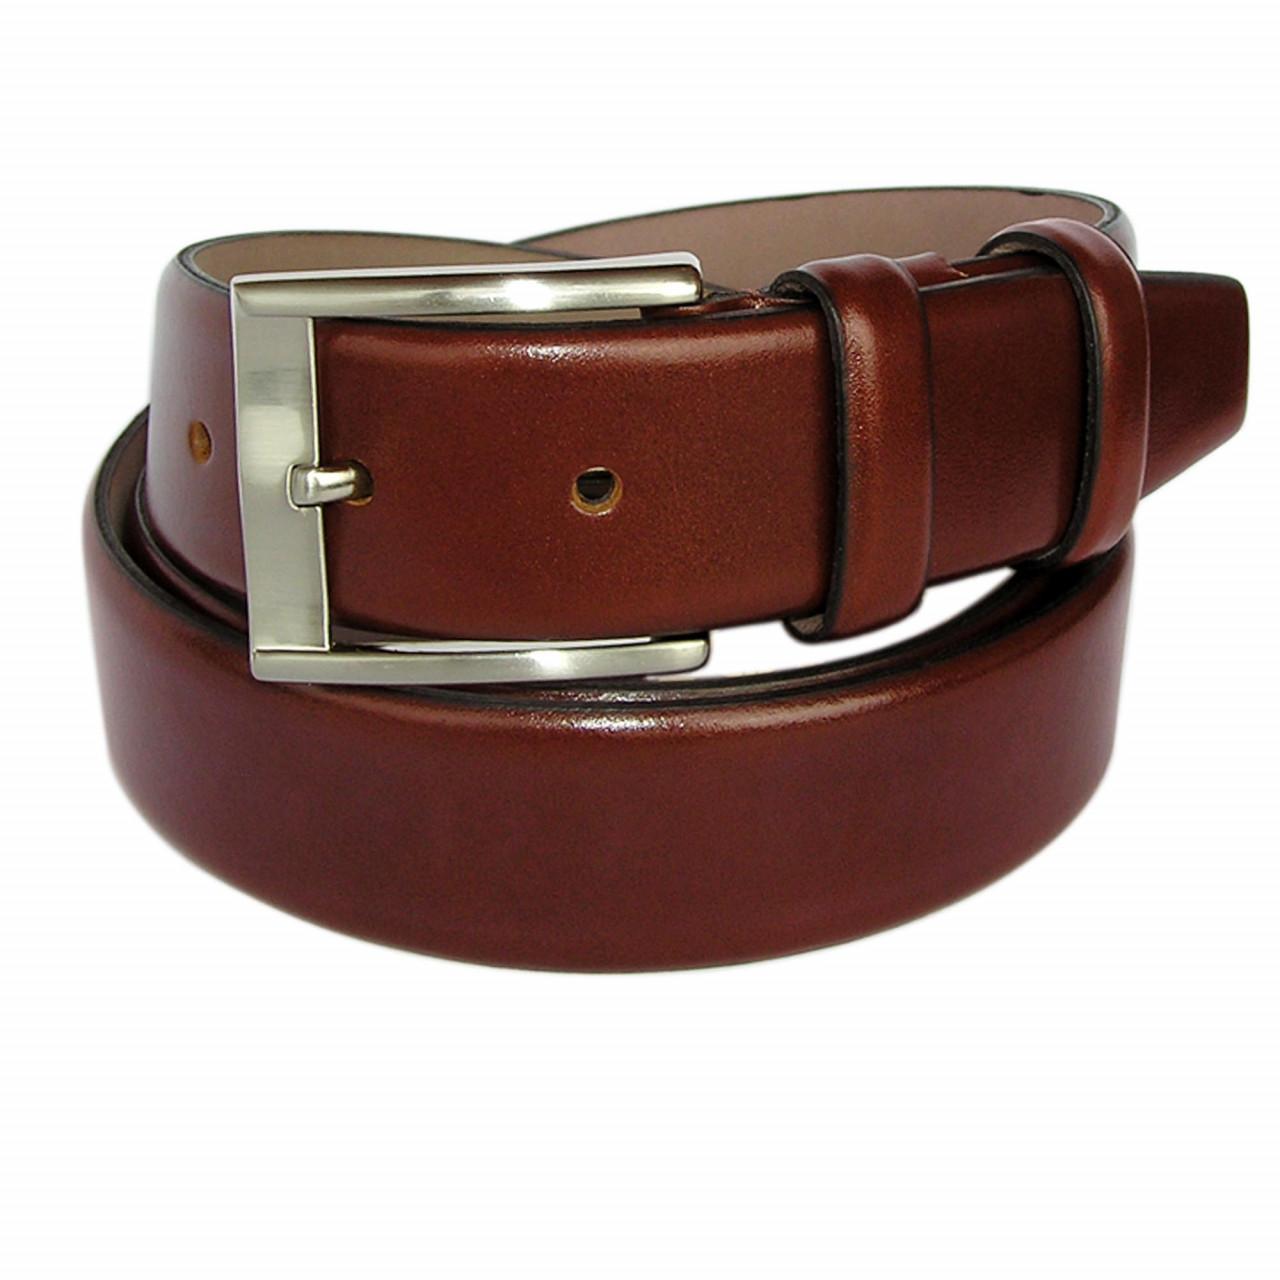 Genuine leather red bordeaux belt